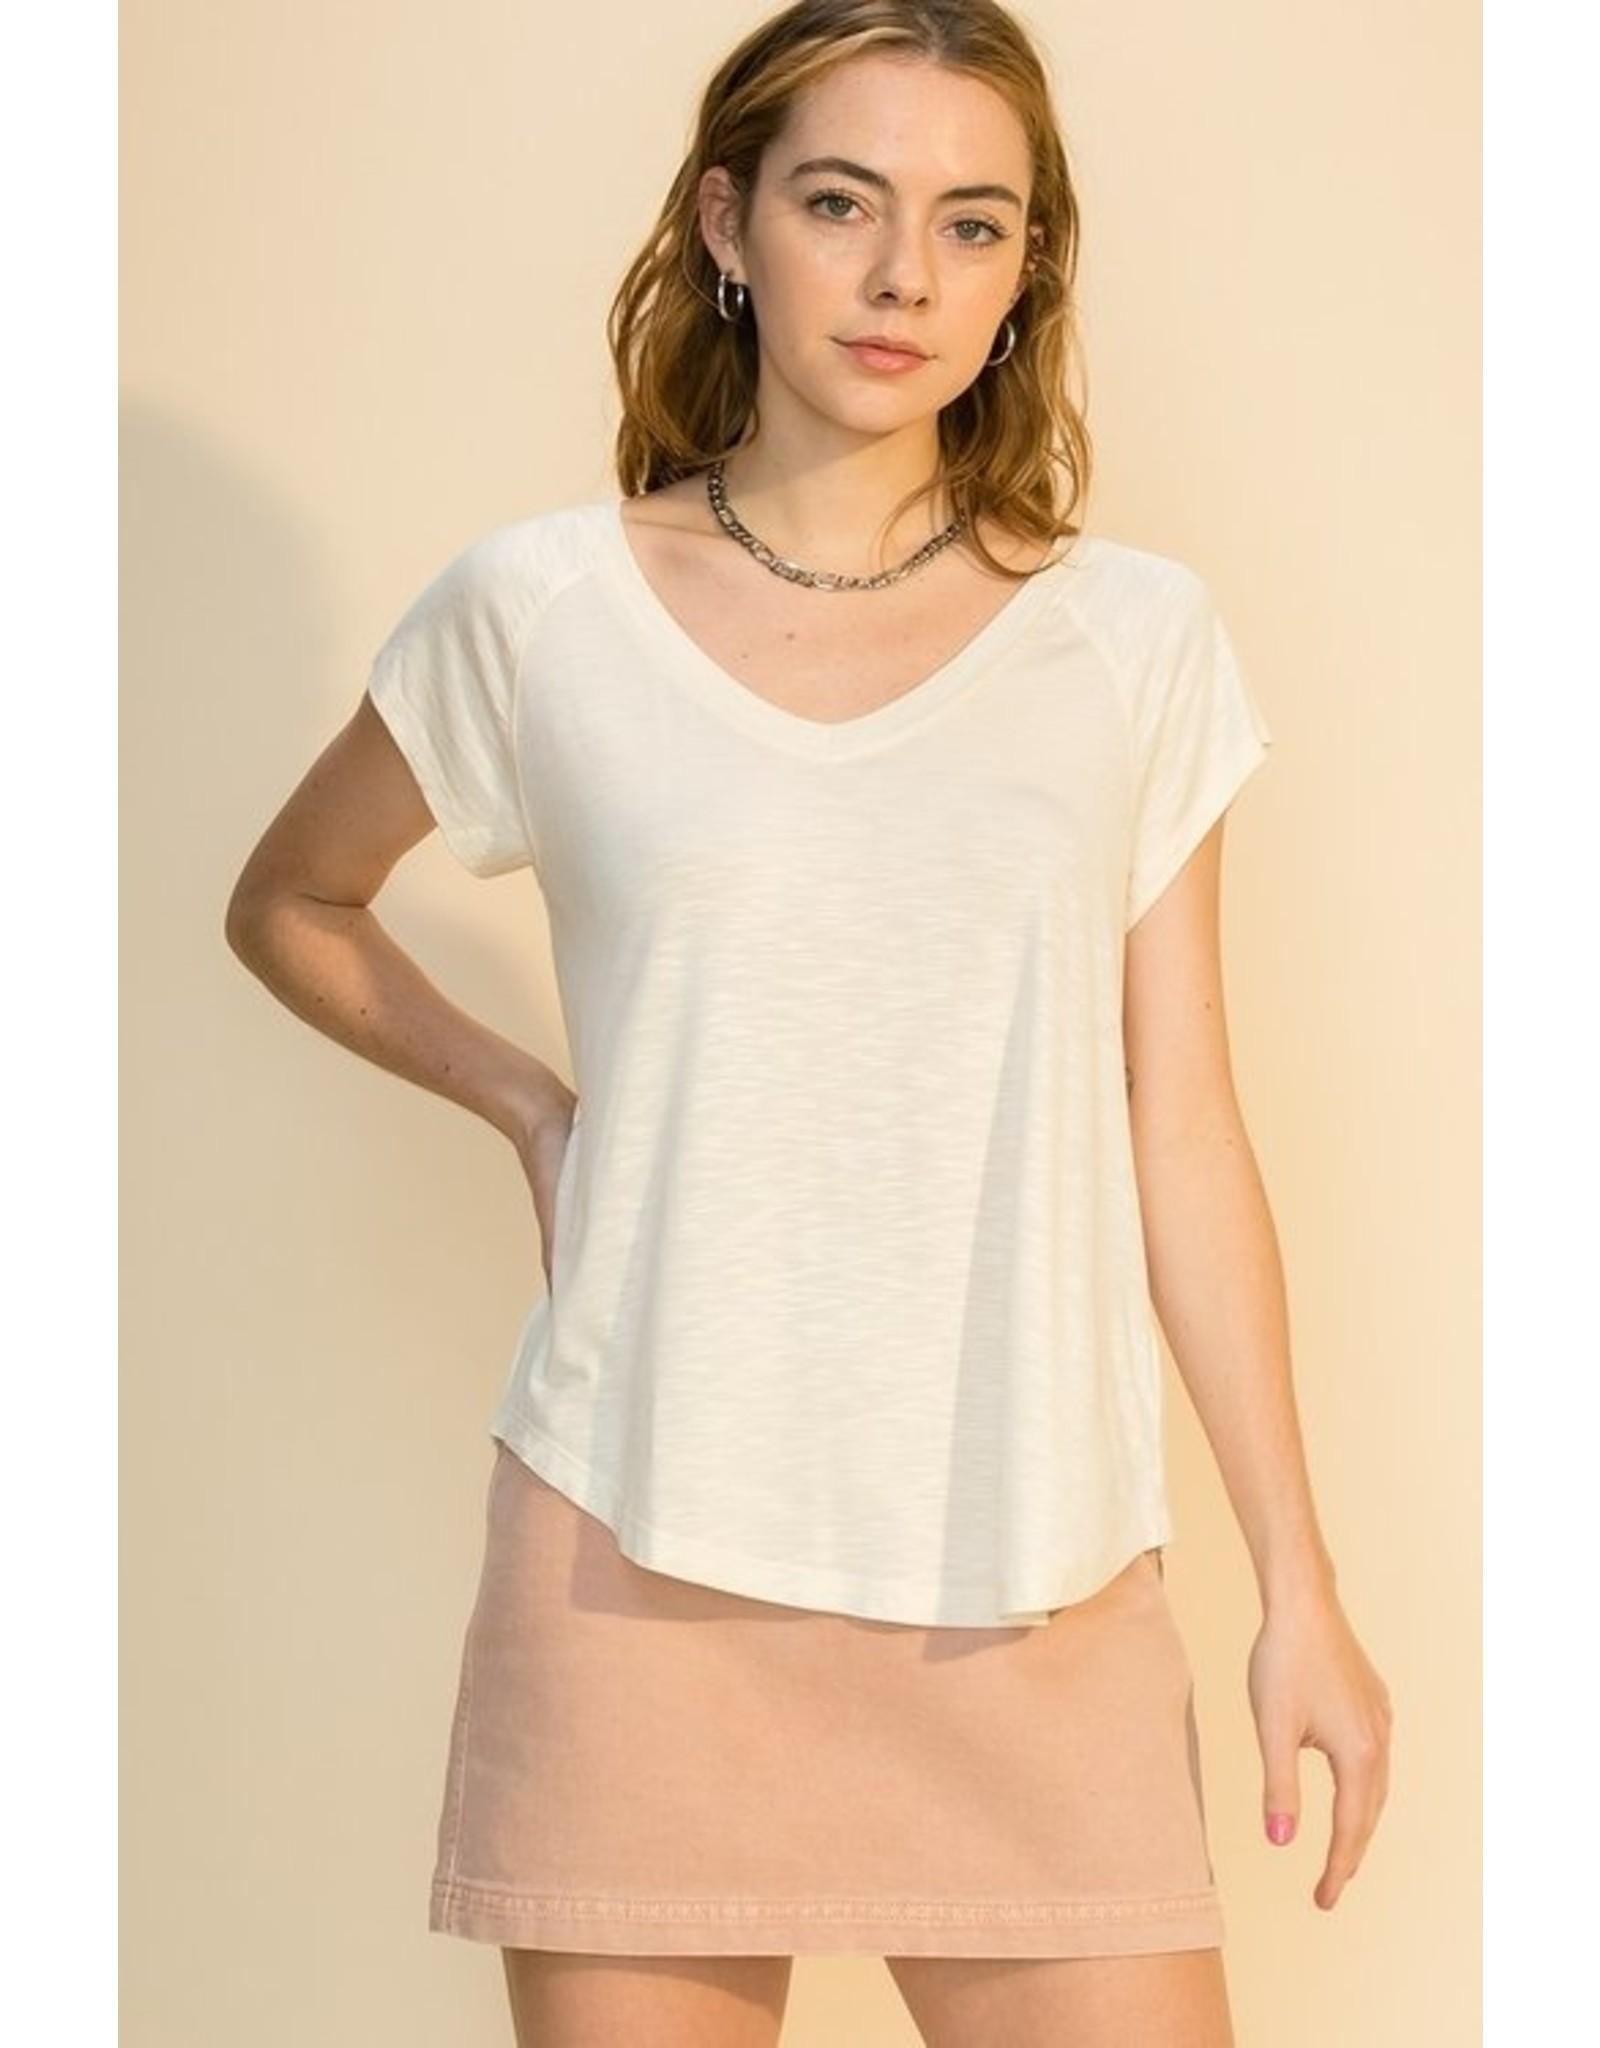 The Ritzy Gypsy BONNIE V-Neck Short Sleeve Top